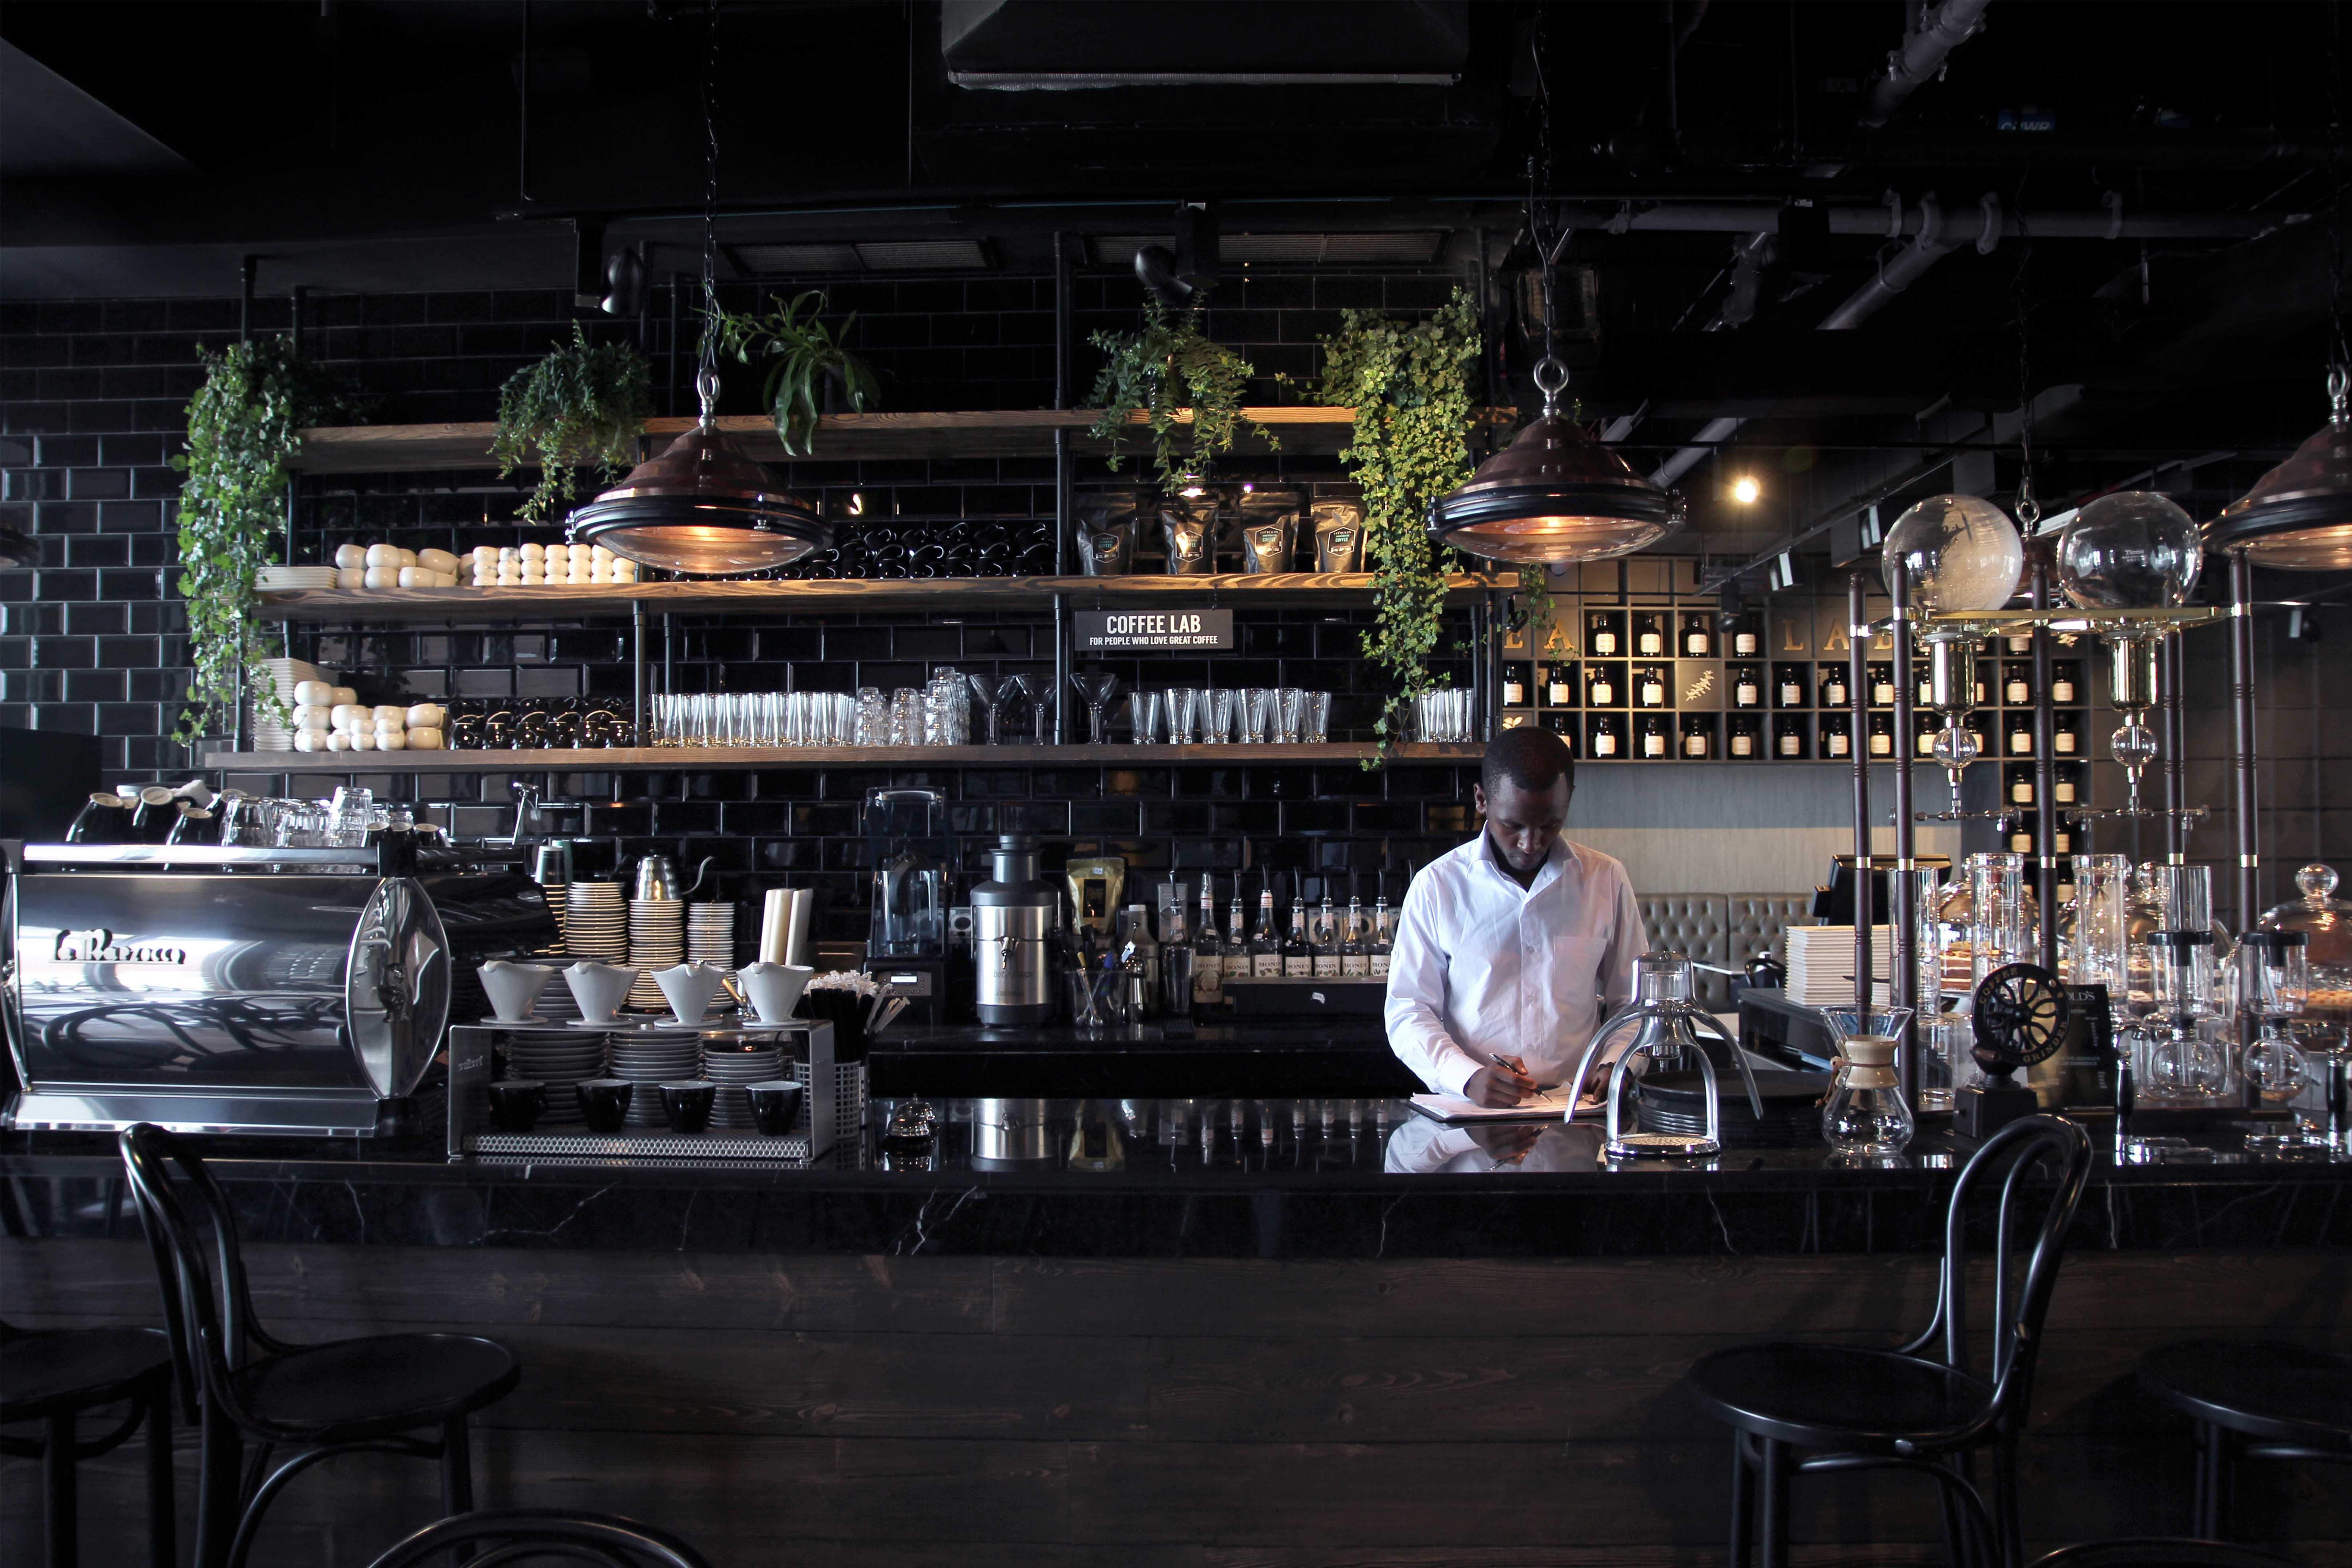 Creneau Interior Design Agency Dubai Middle East Leopold's of London Main Bar